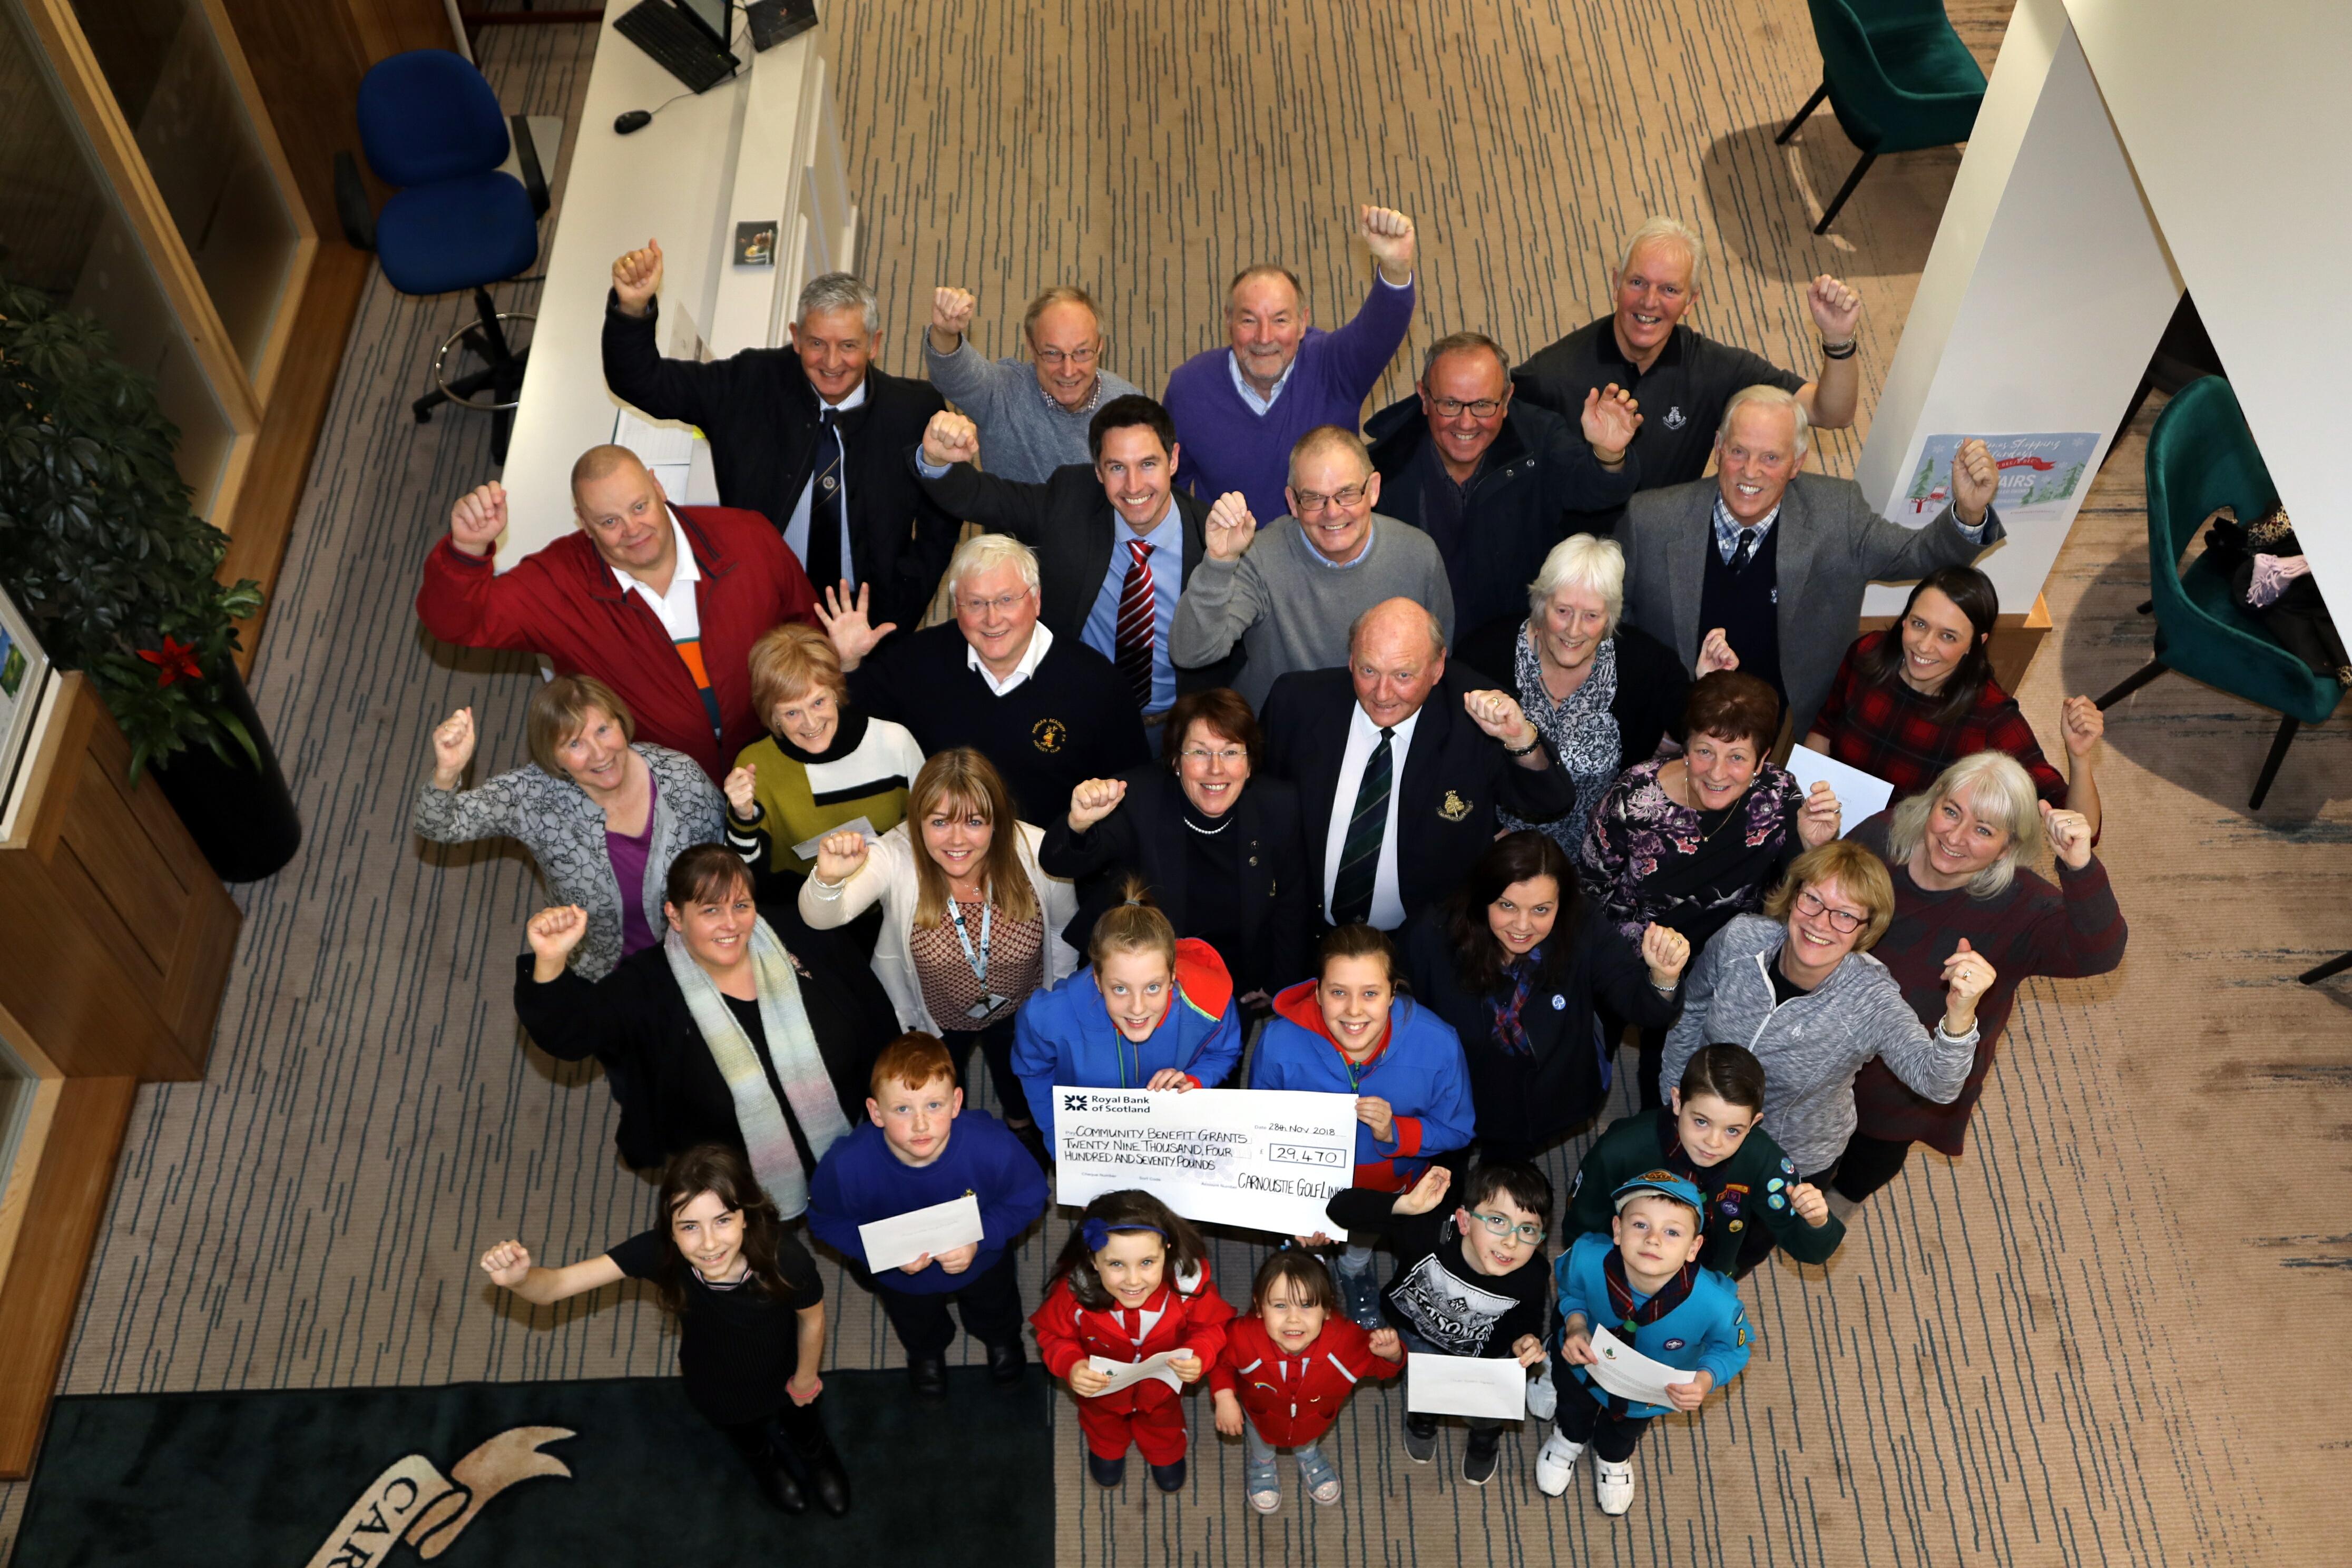 Recipient representatives and CGLMC figures at the Links House handover